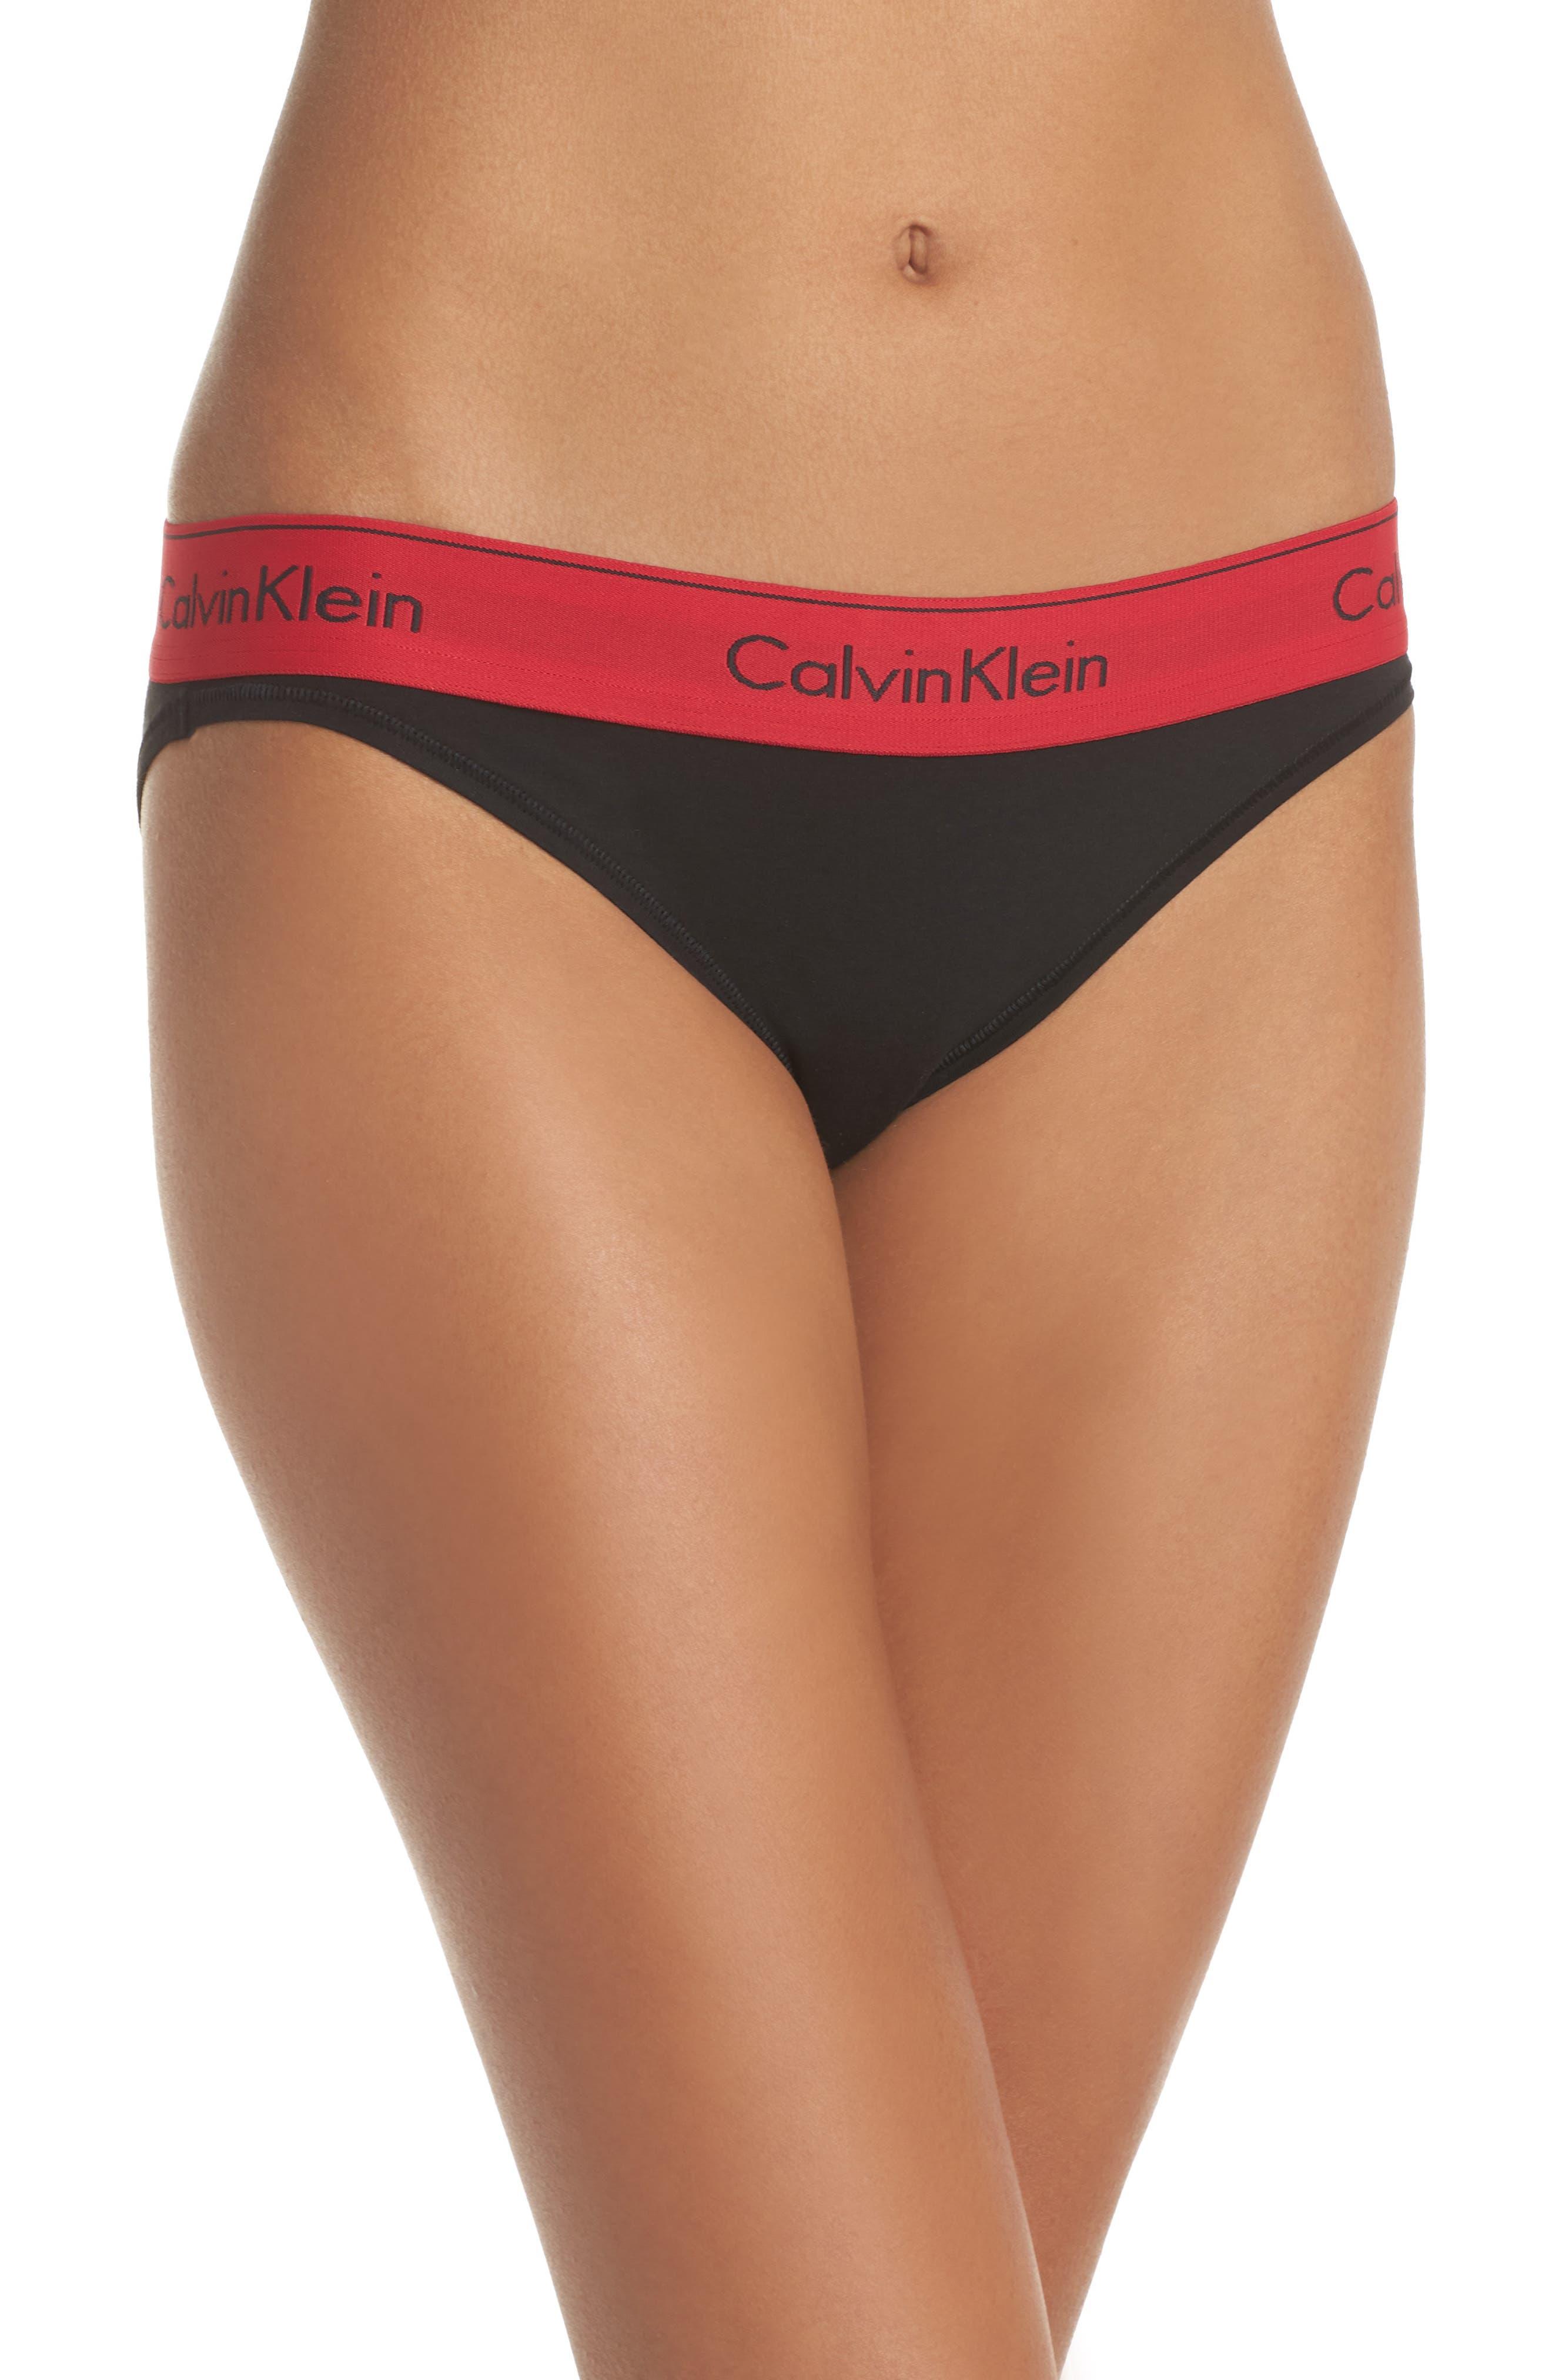 'Modern Cotton Collection' Cotton Blend Bikini,                             Main thumbnail 1, color,                             Black Empower